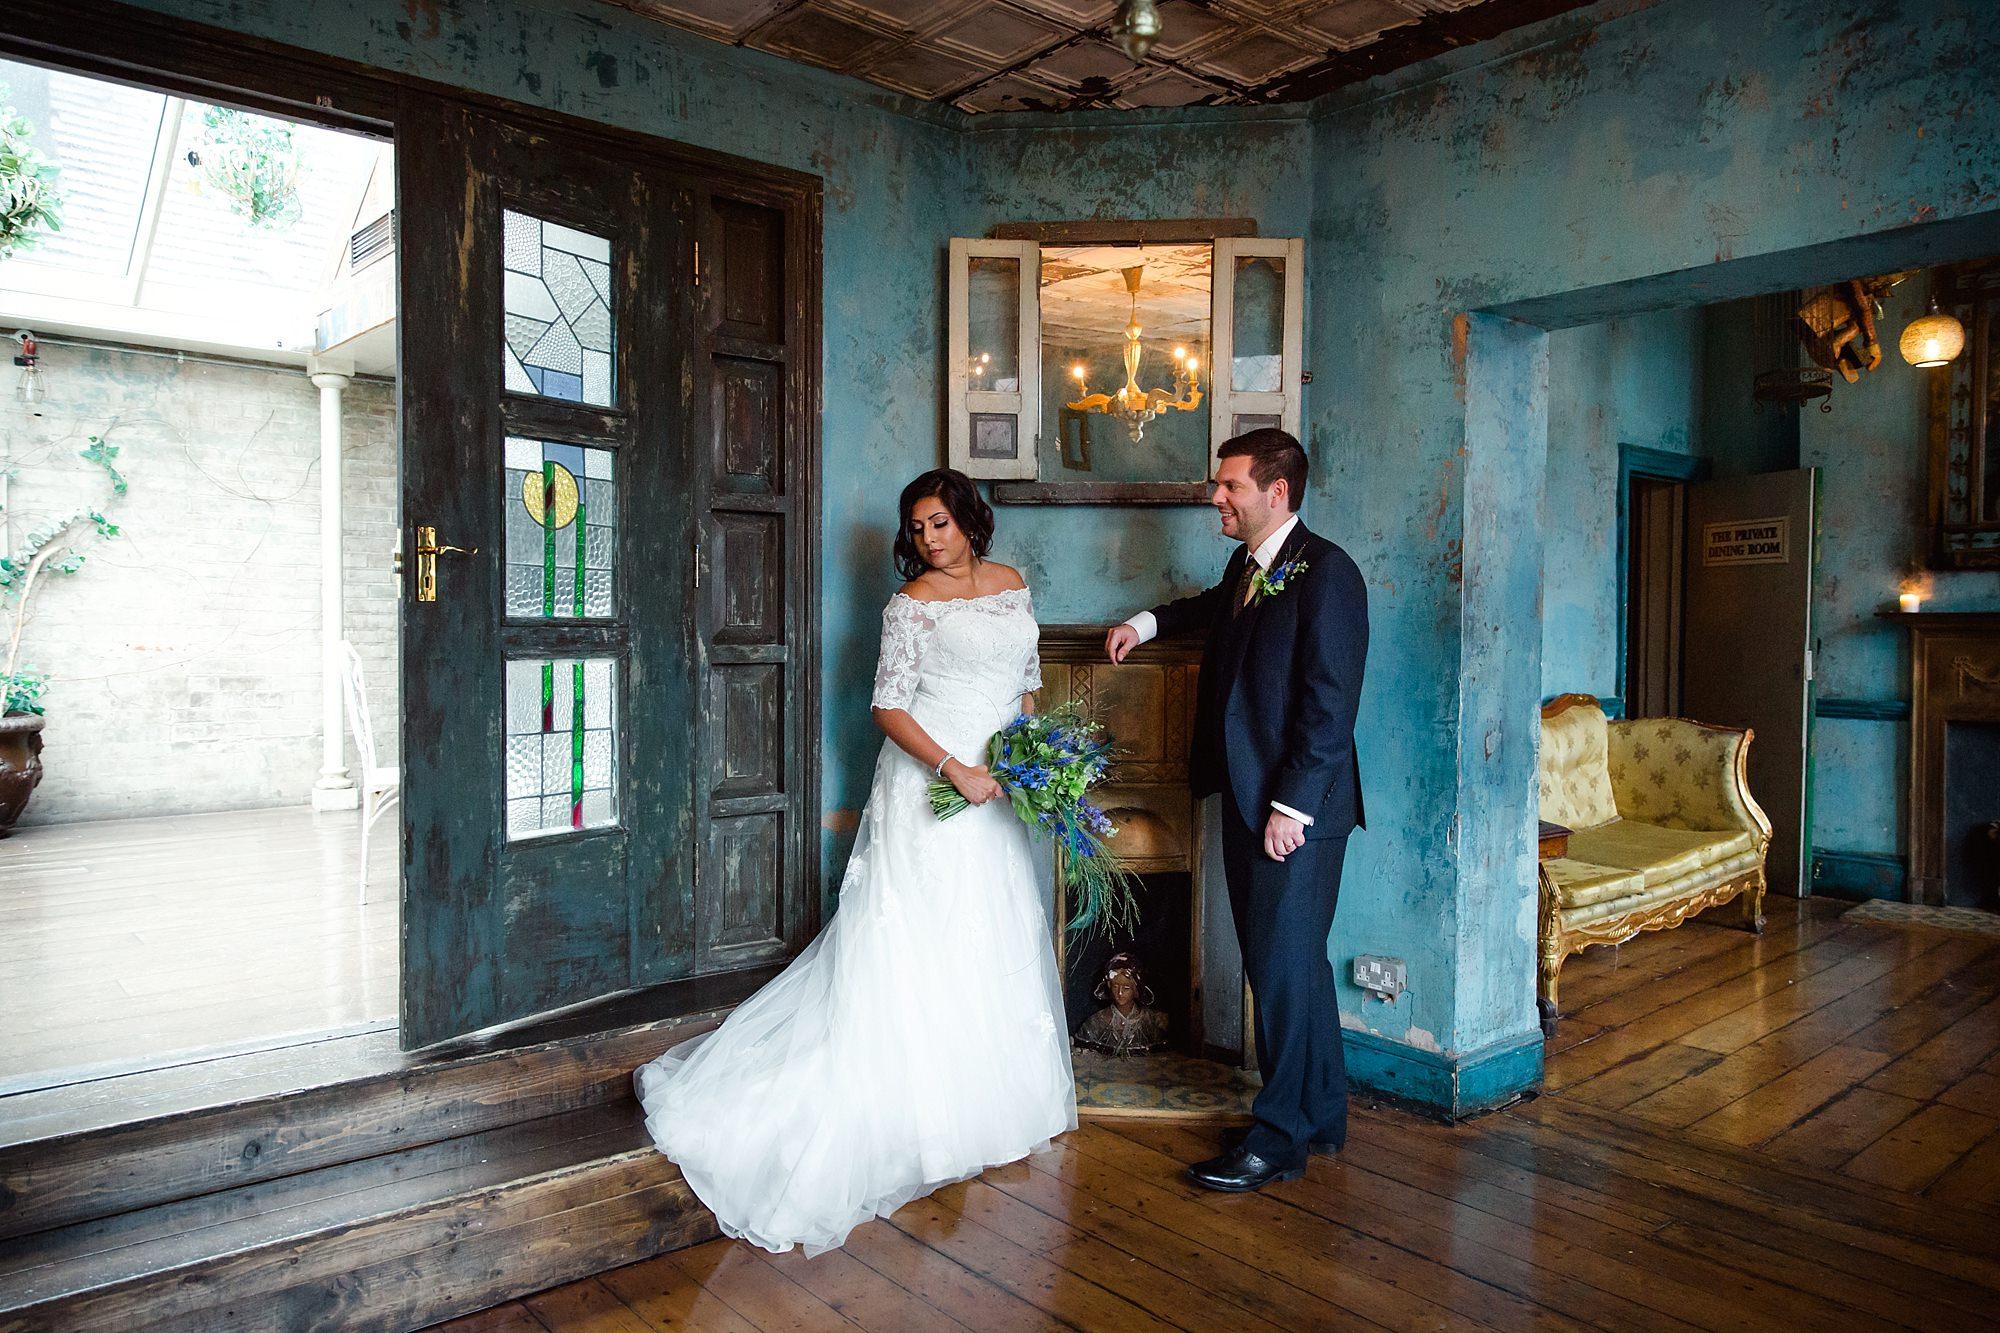 Paradise by way of Kensal Green wedding portrait